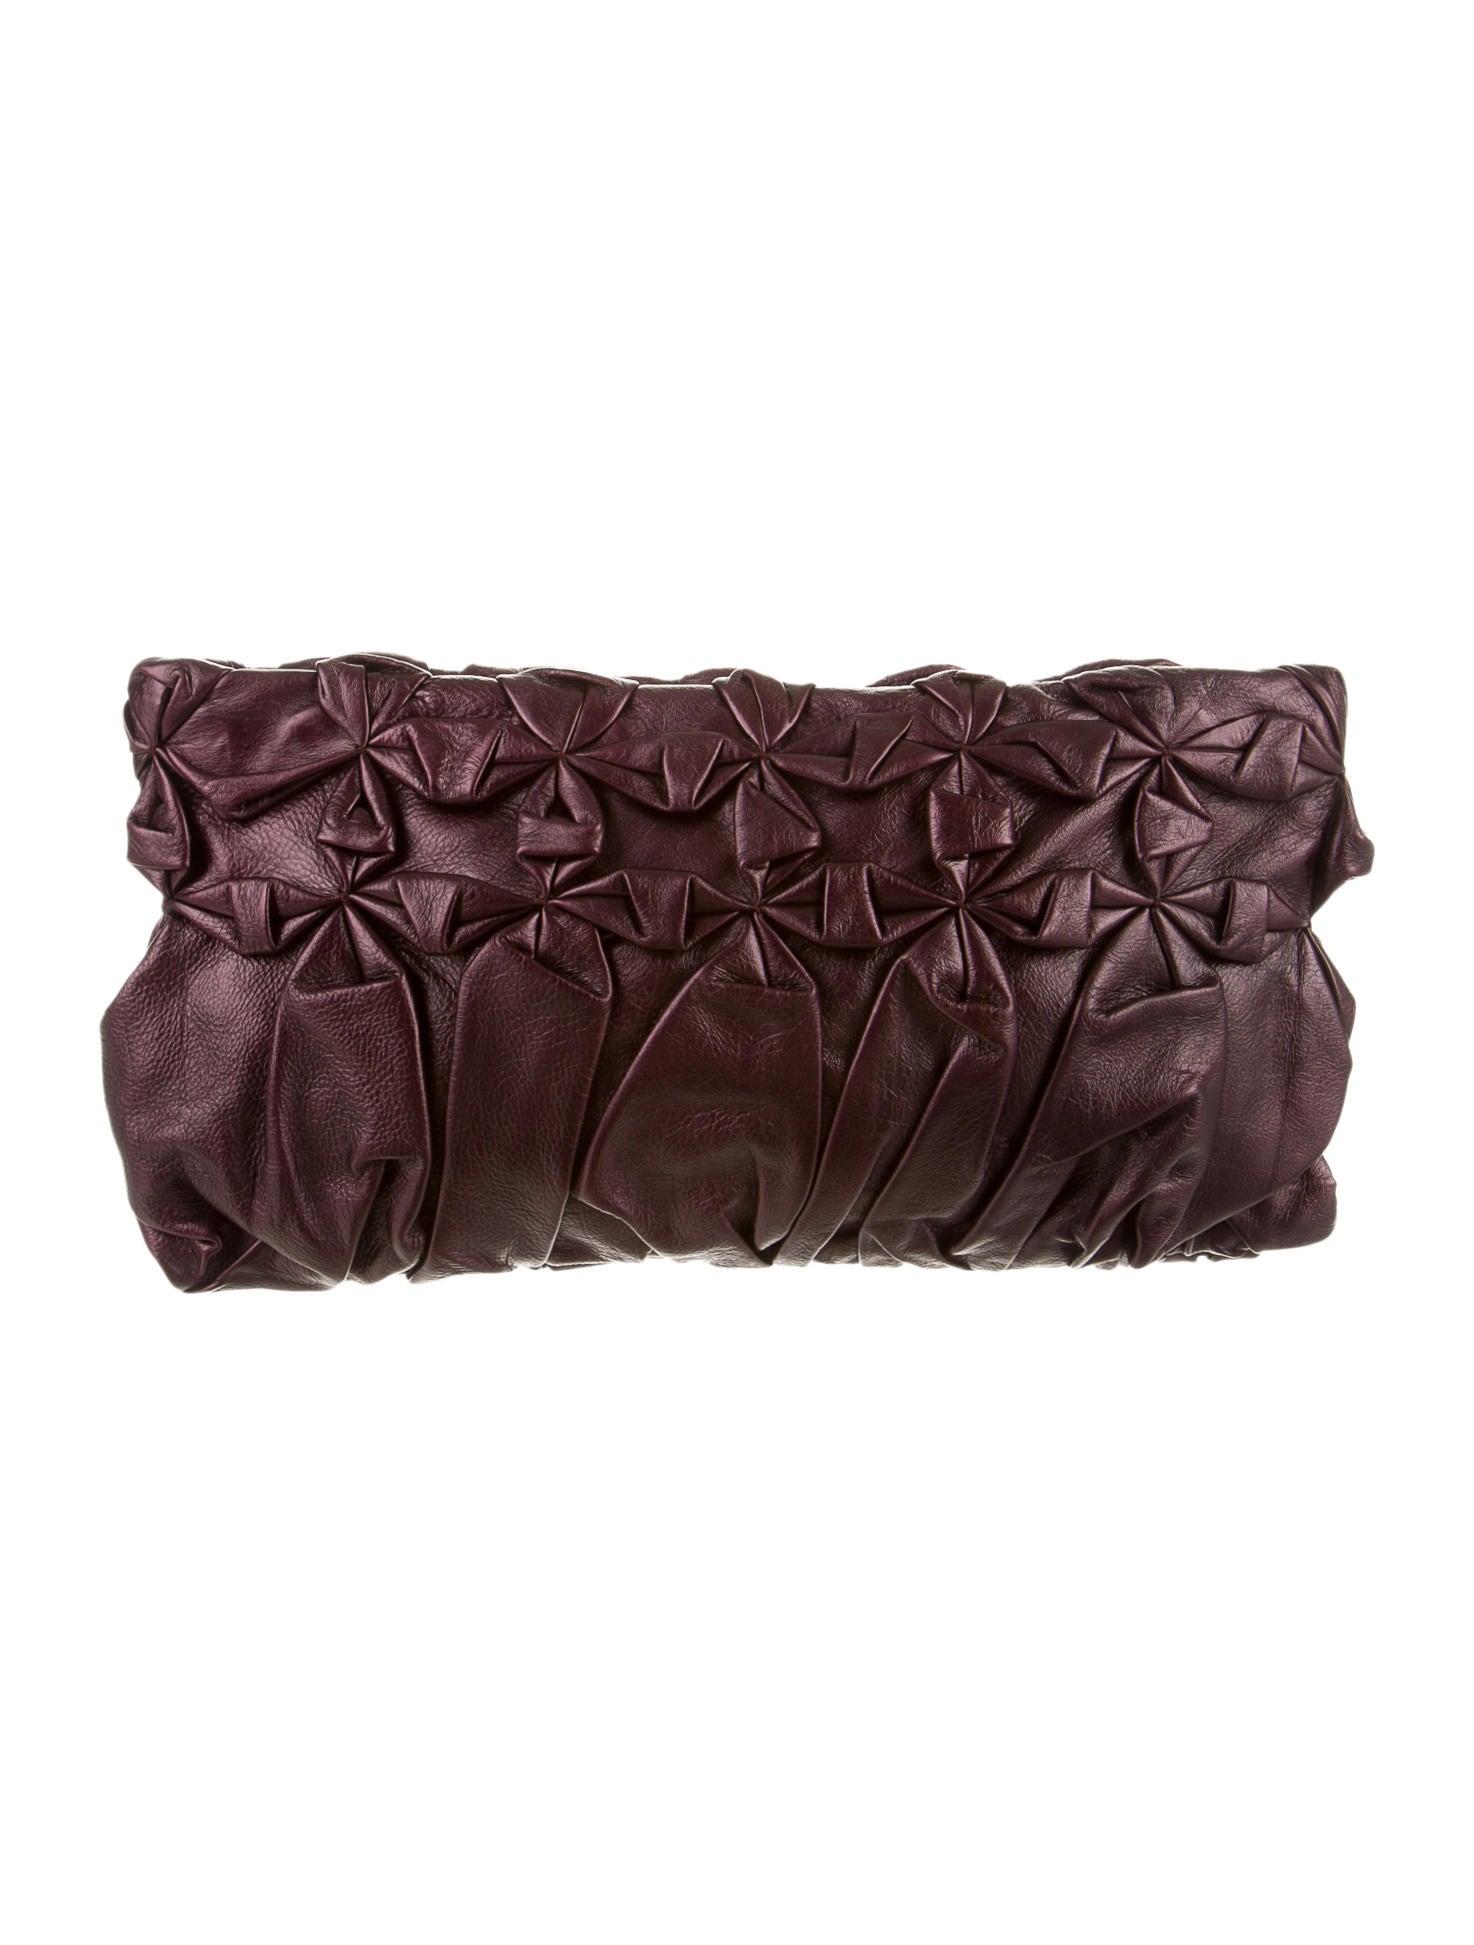 prada designer wallets - Prada Nappa Pleated Clutch - Handbags - PRA81699 | The RealReal